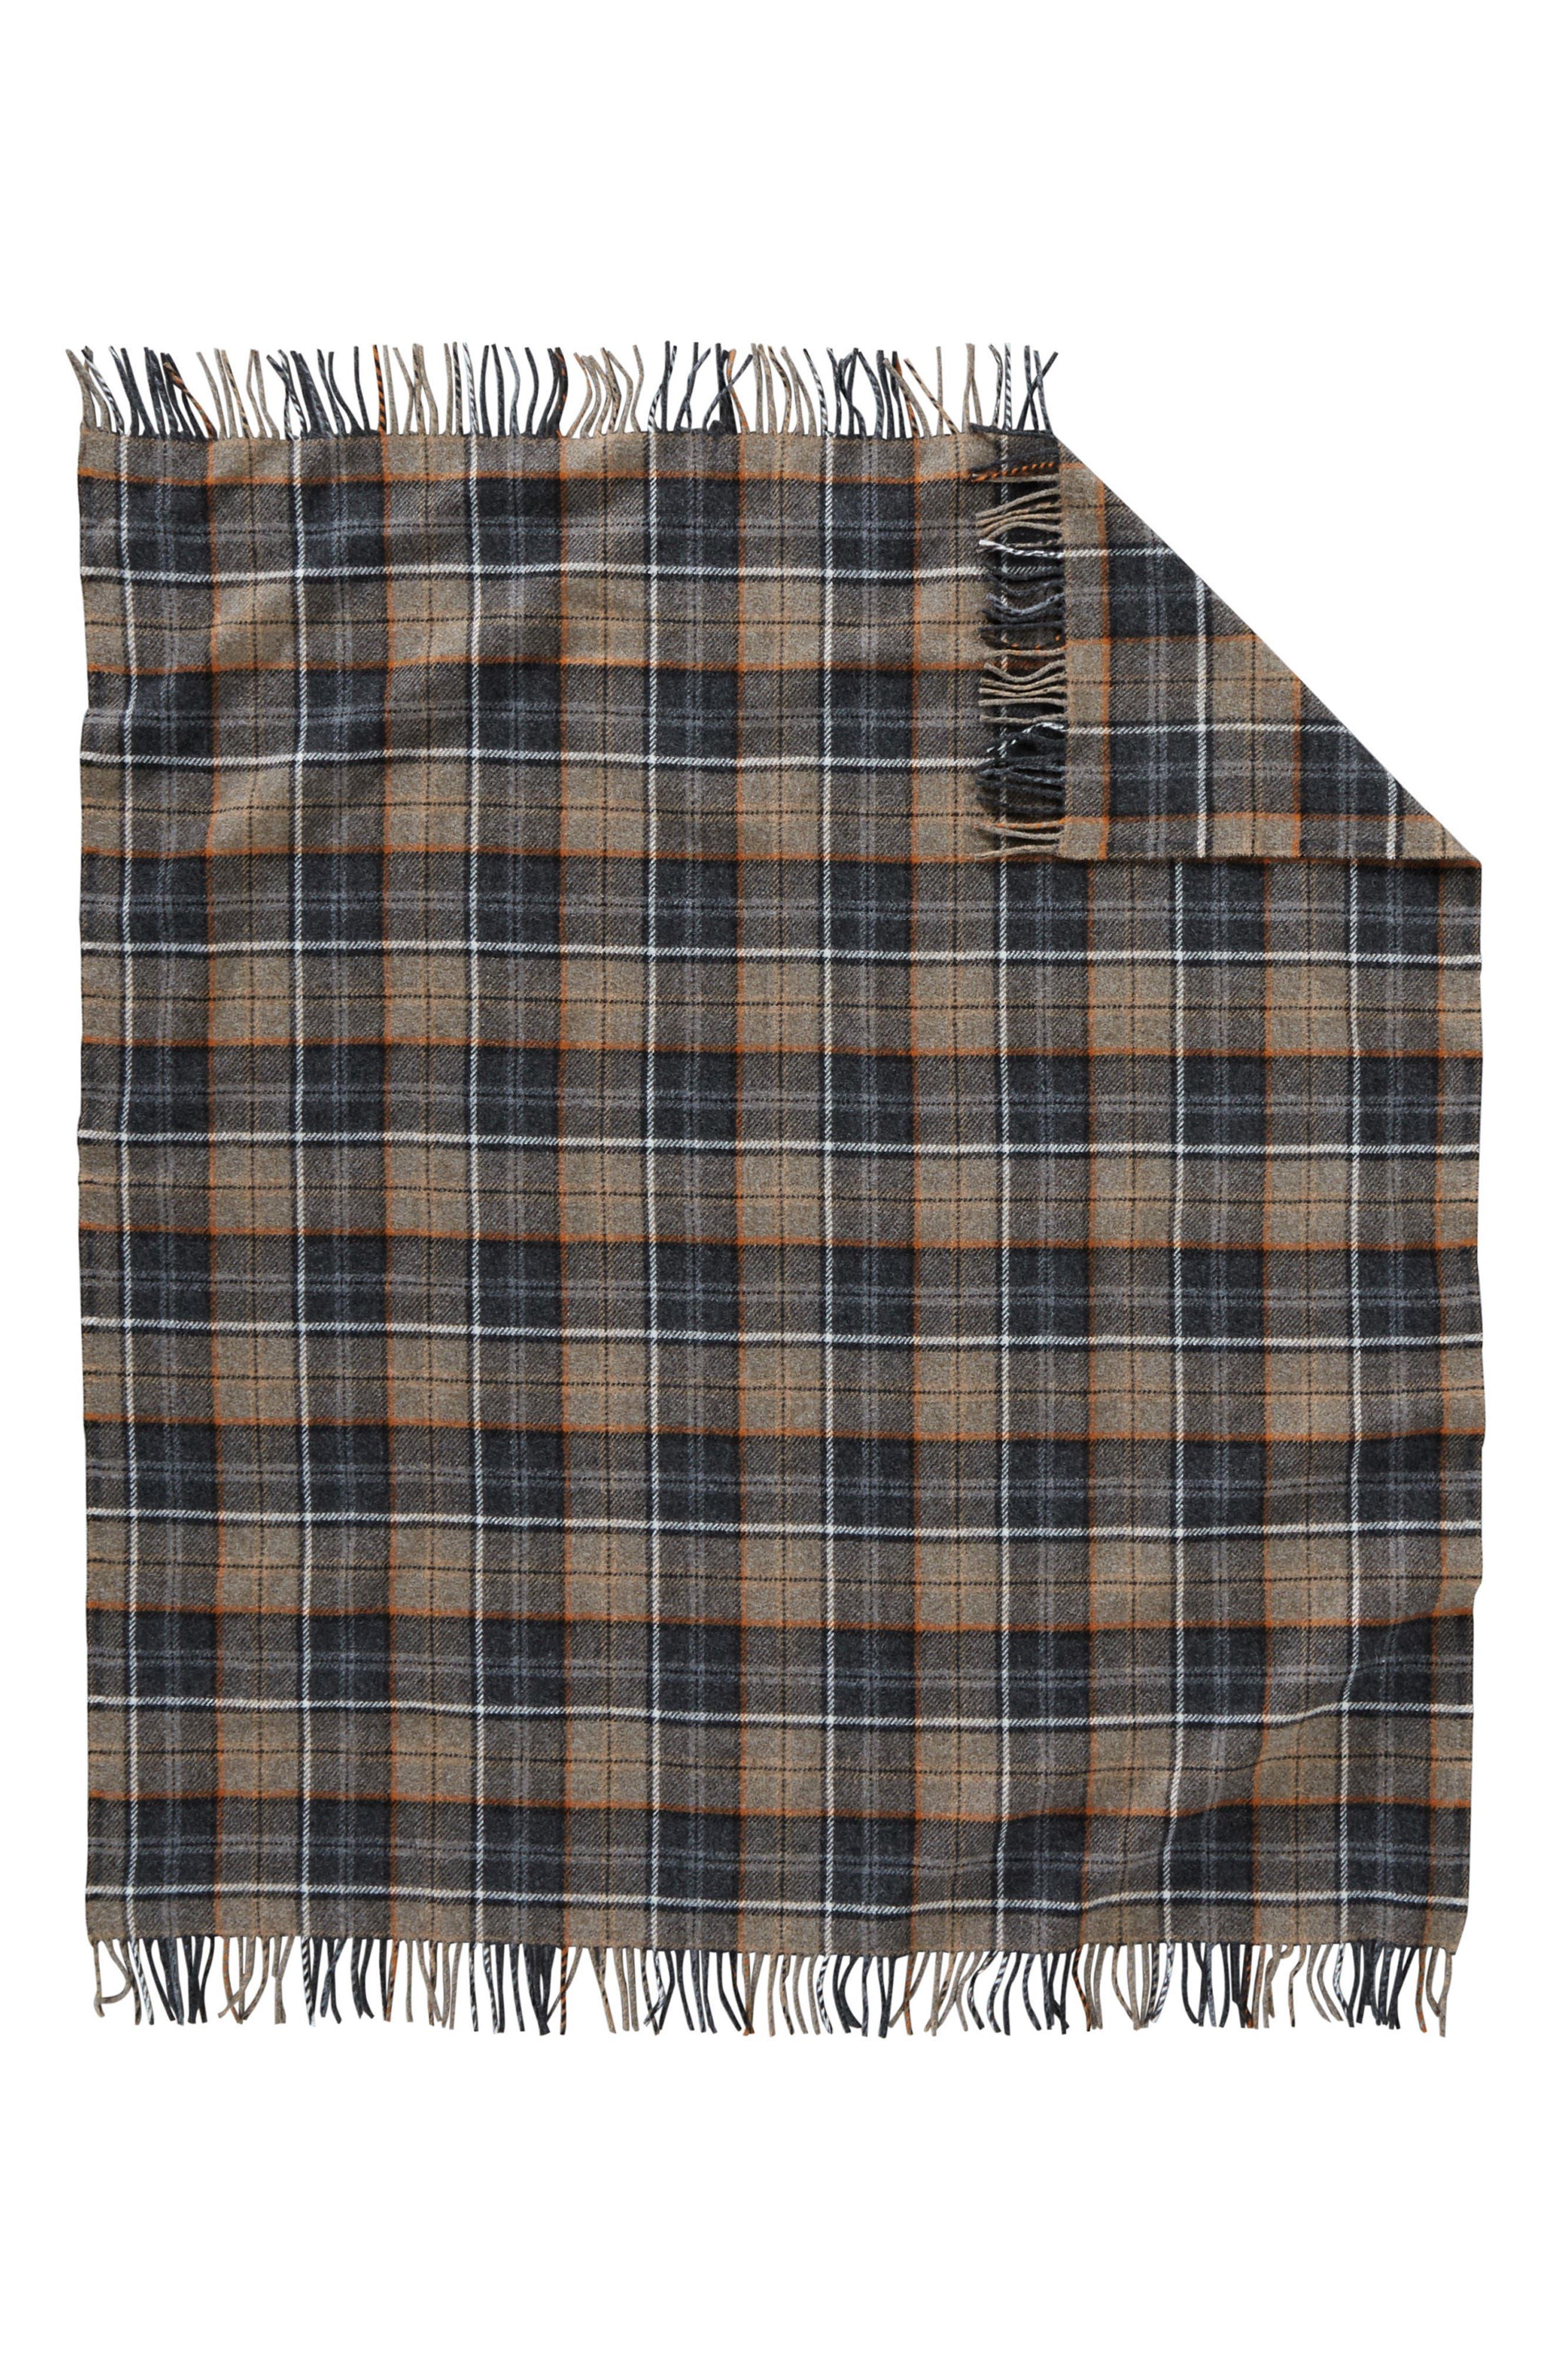 Plaid Wool Throw,                             Alternate thumbnail 2, color,                             020